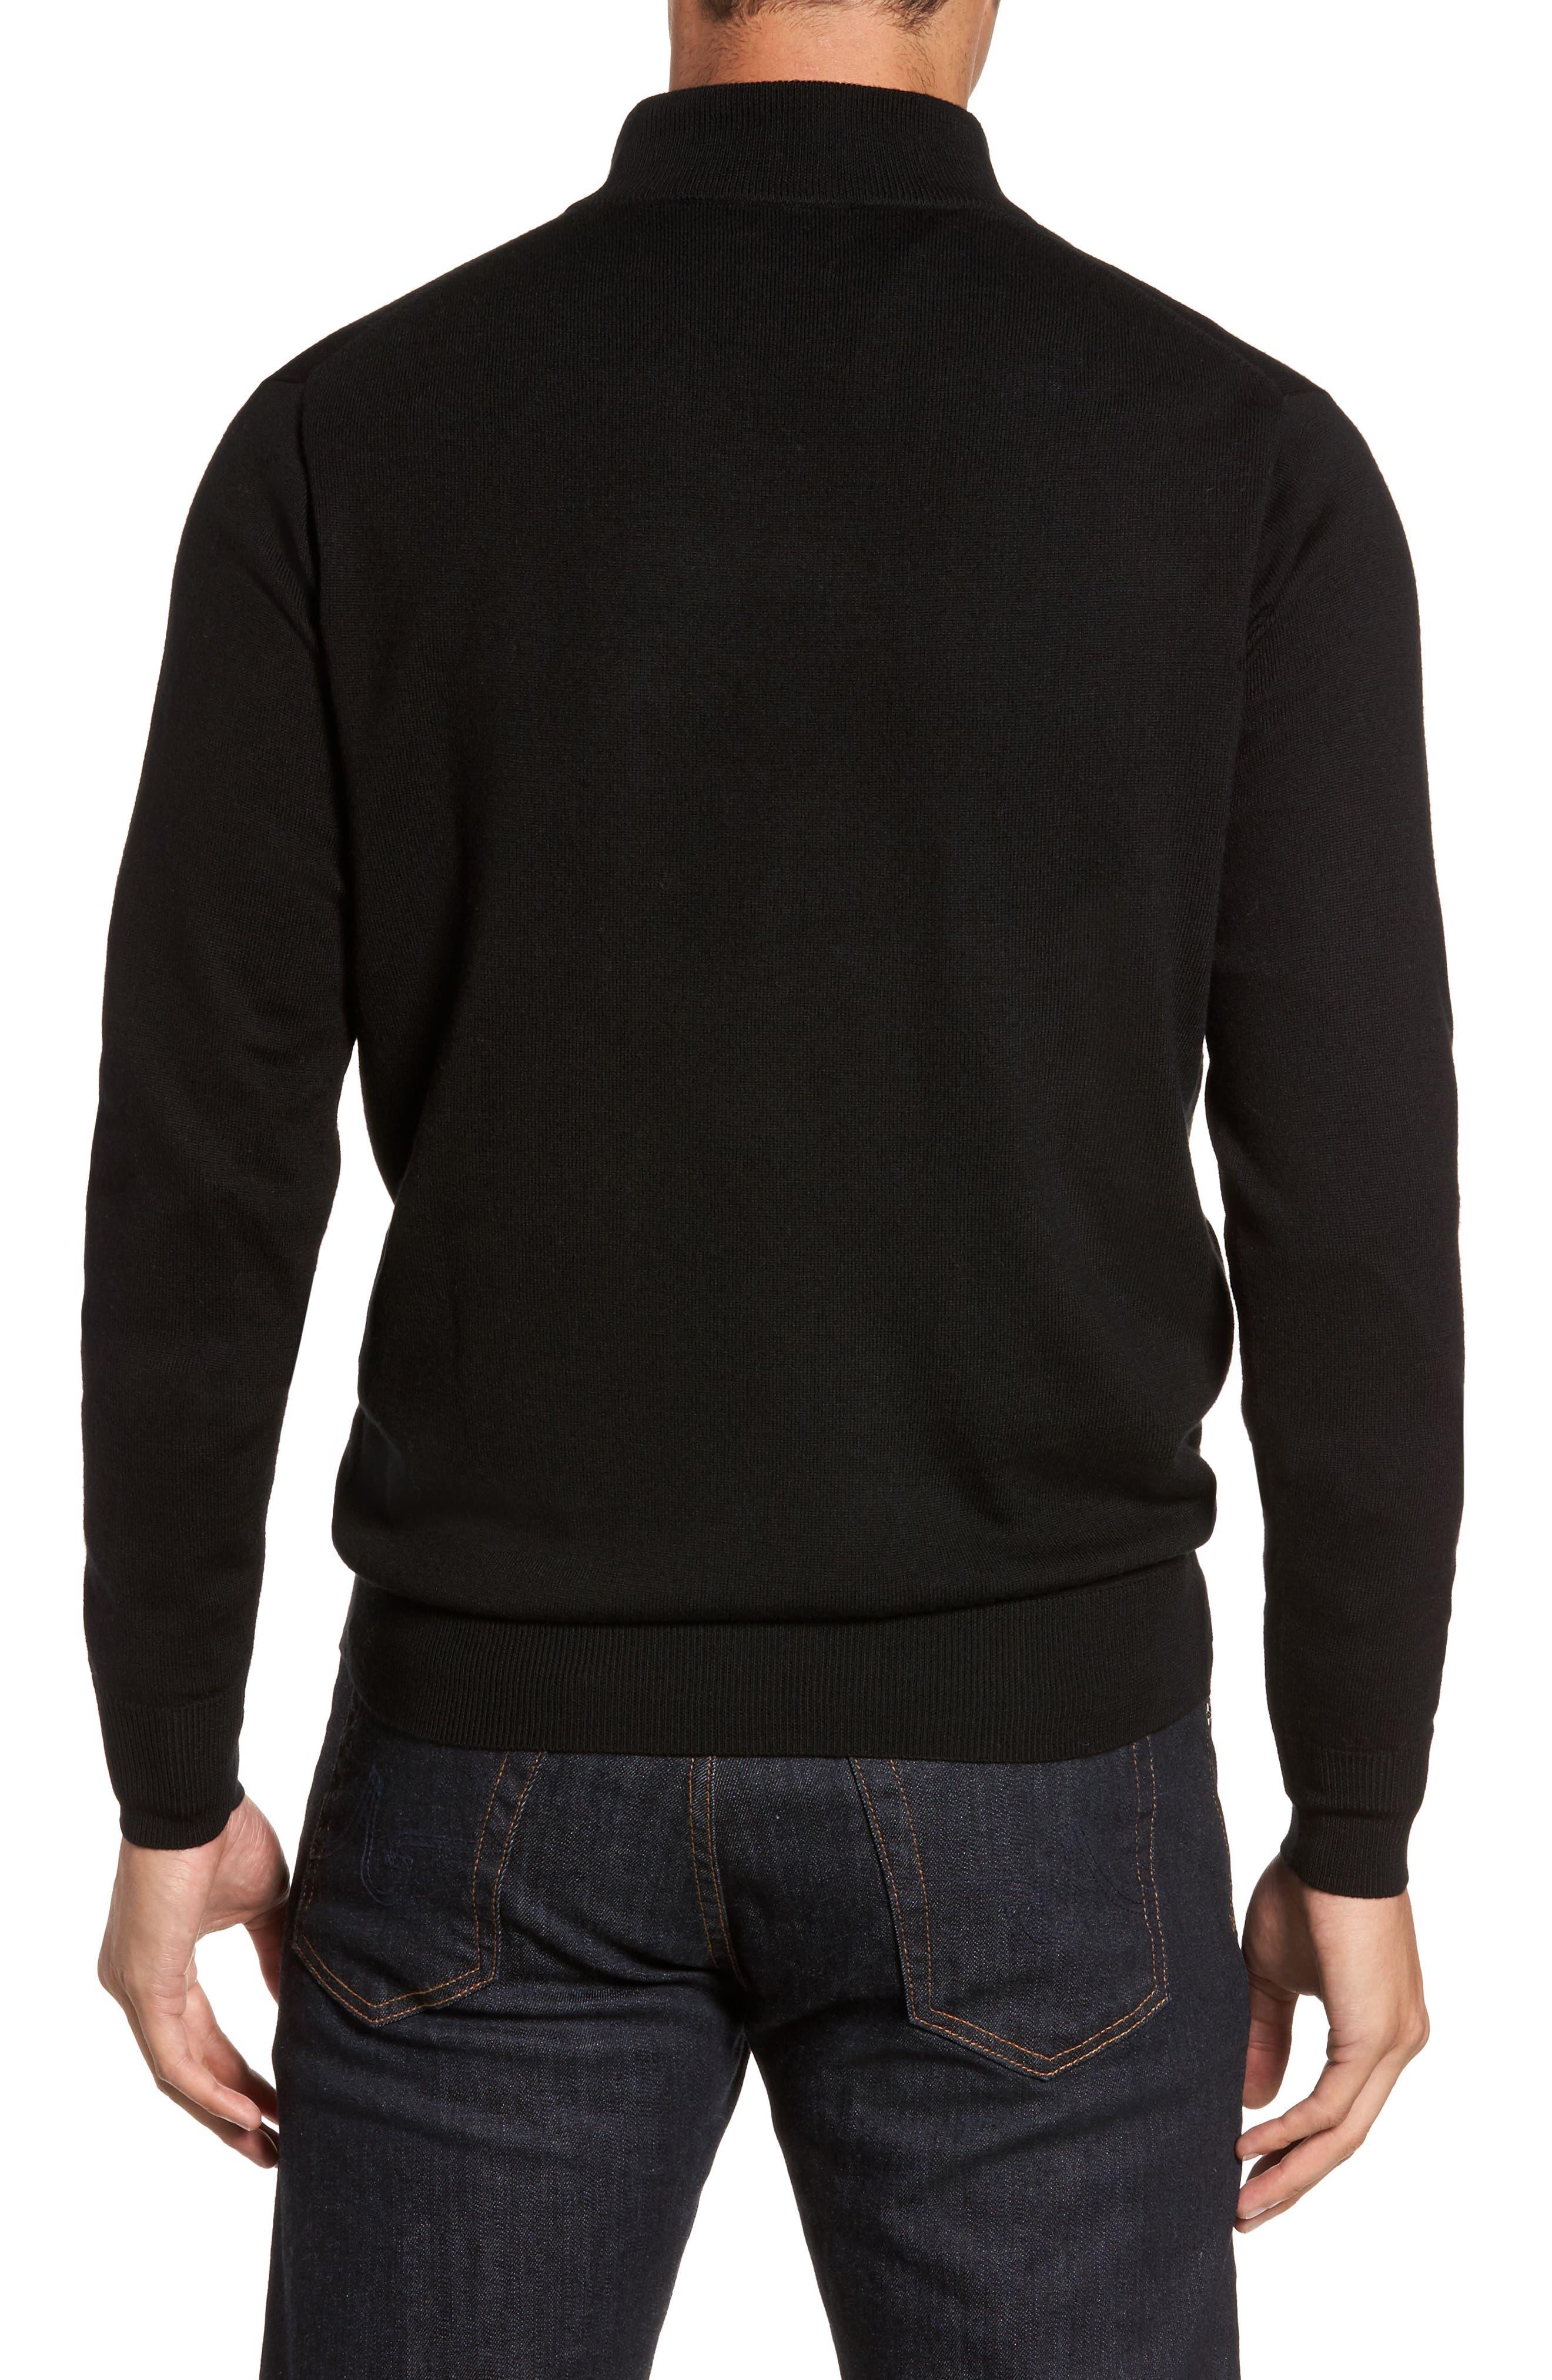 Crown Soft Merino Blend Quarter Zip Sweater,                             Alternate thumbnail 2, color,                             001